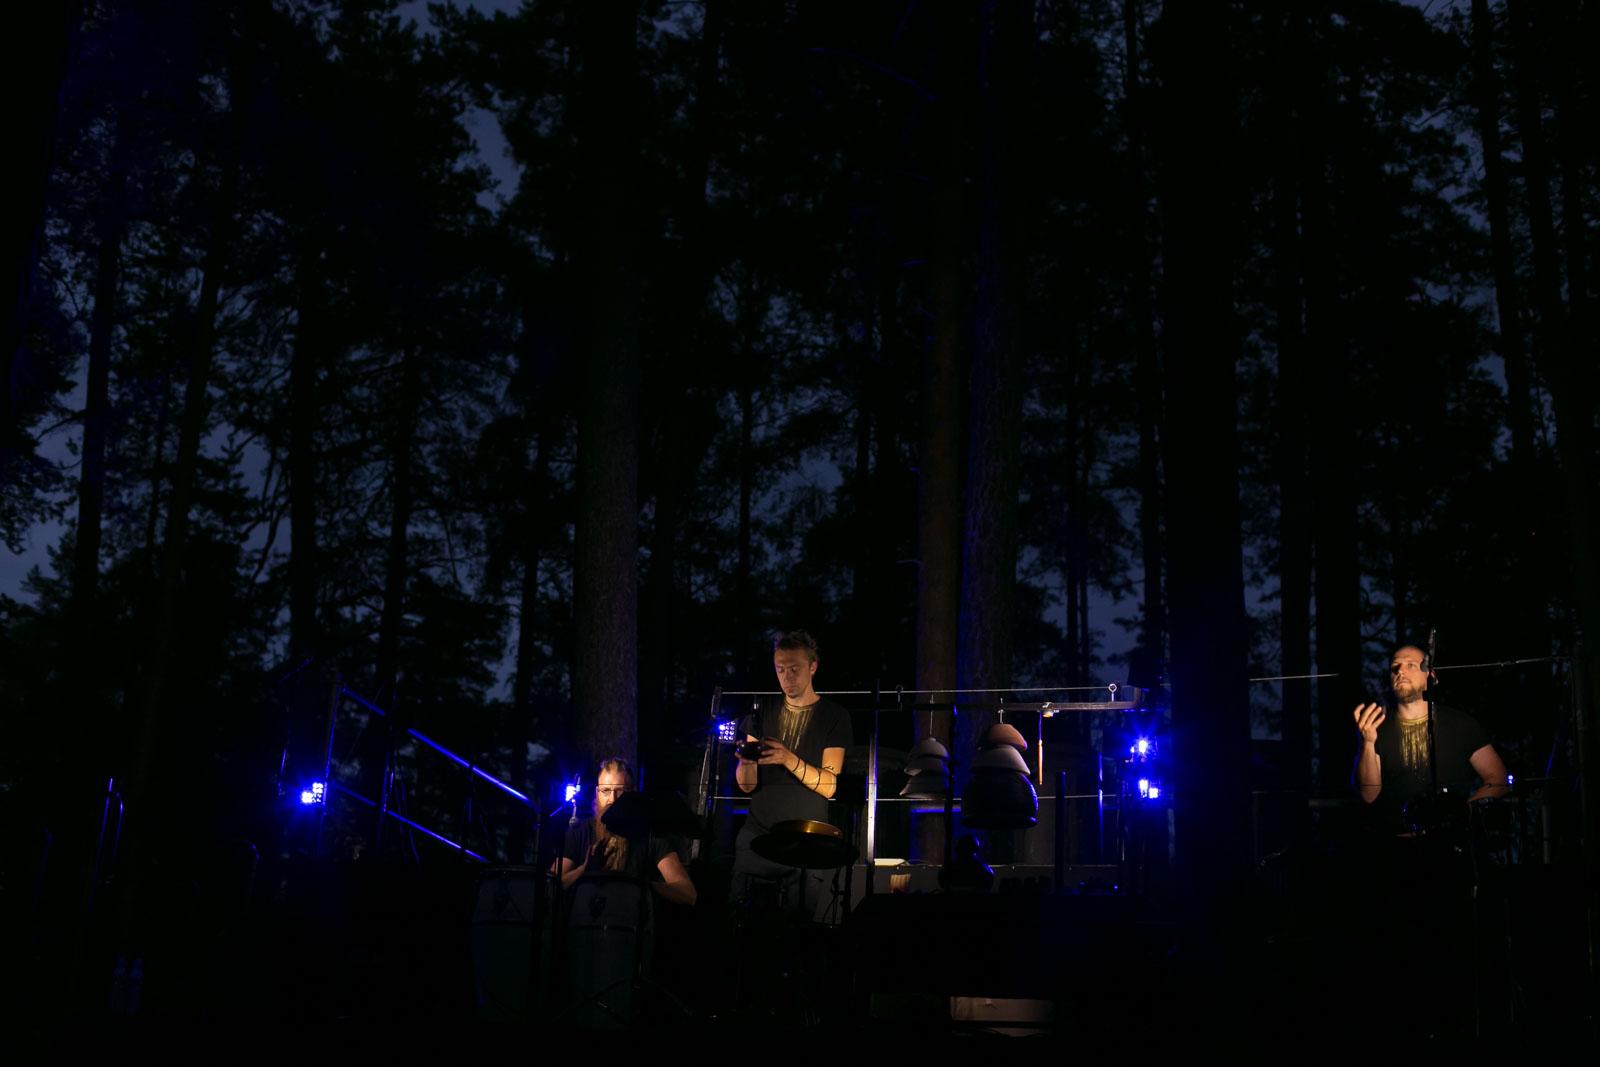 foto_LaumaKalnina-8420